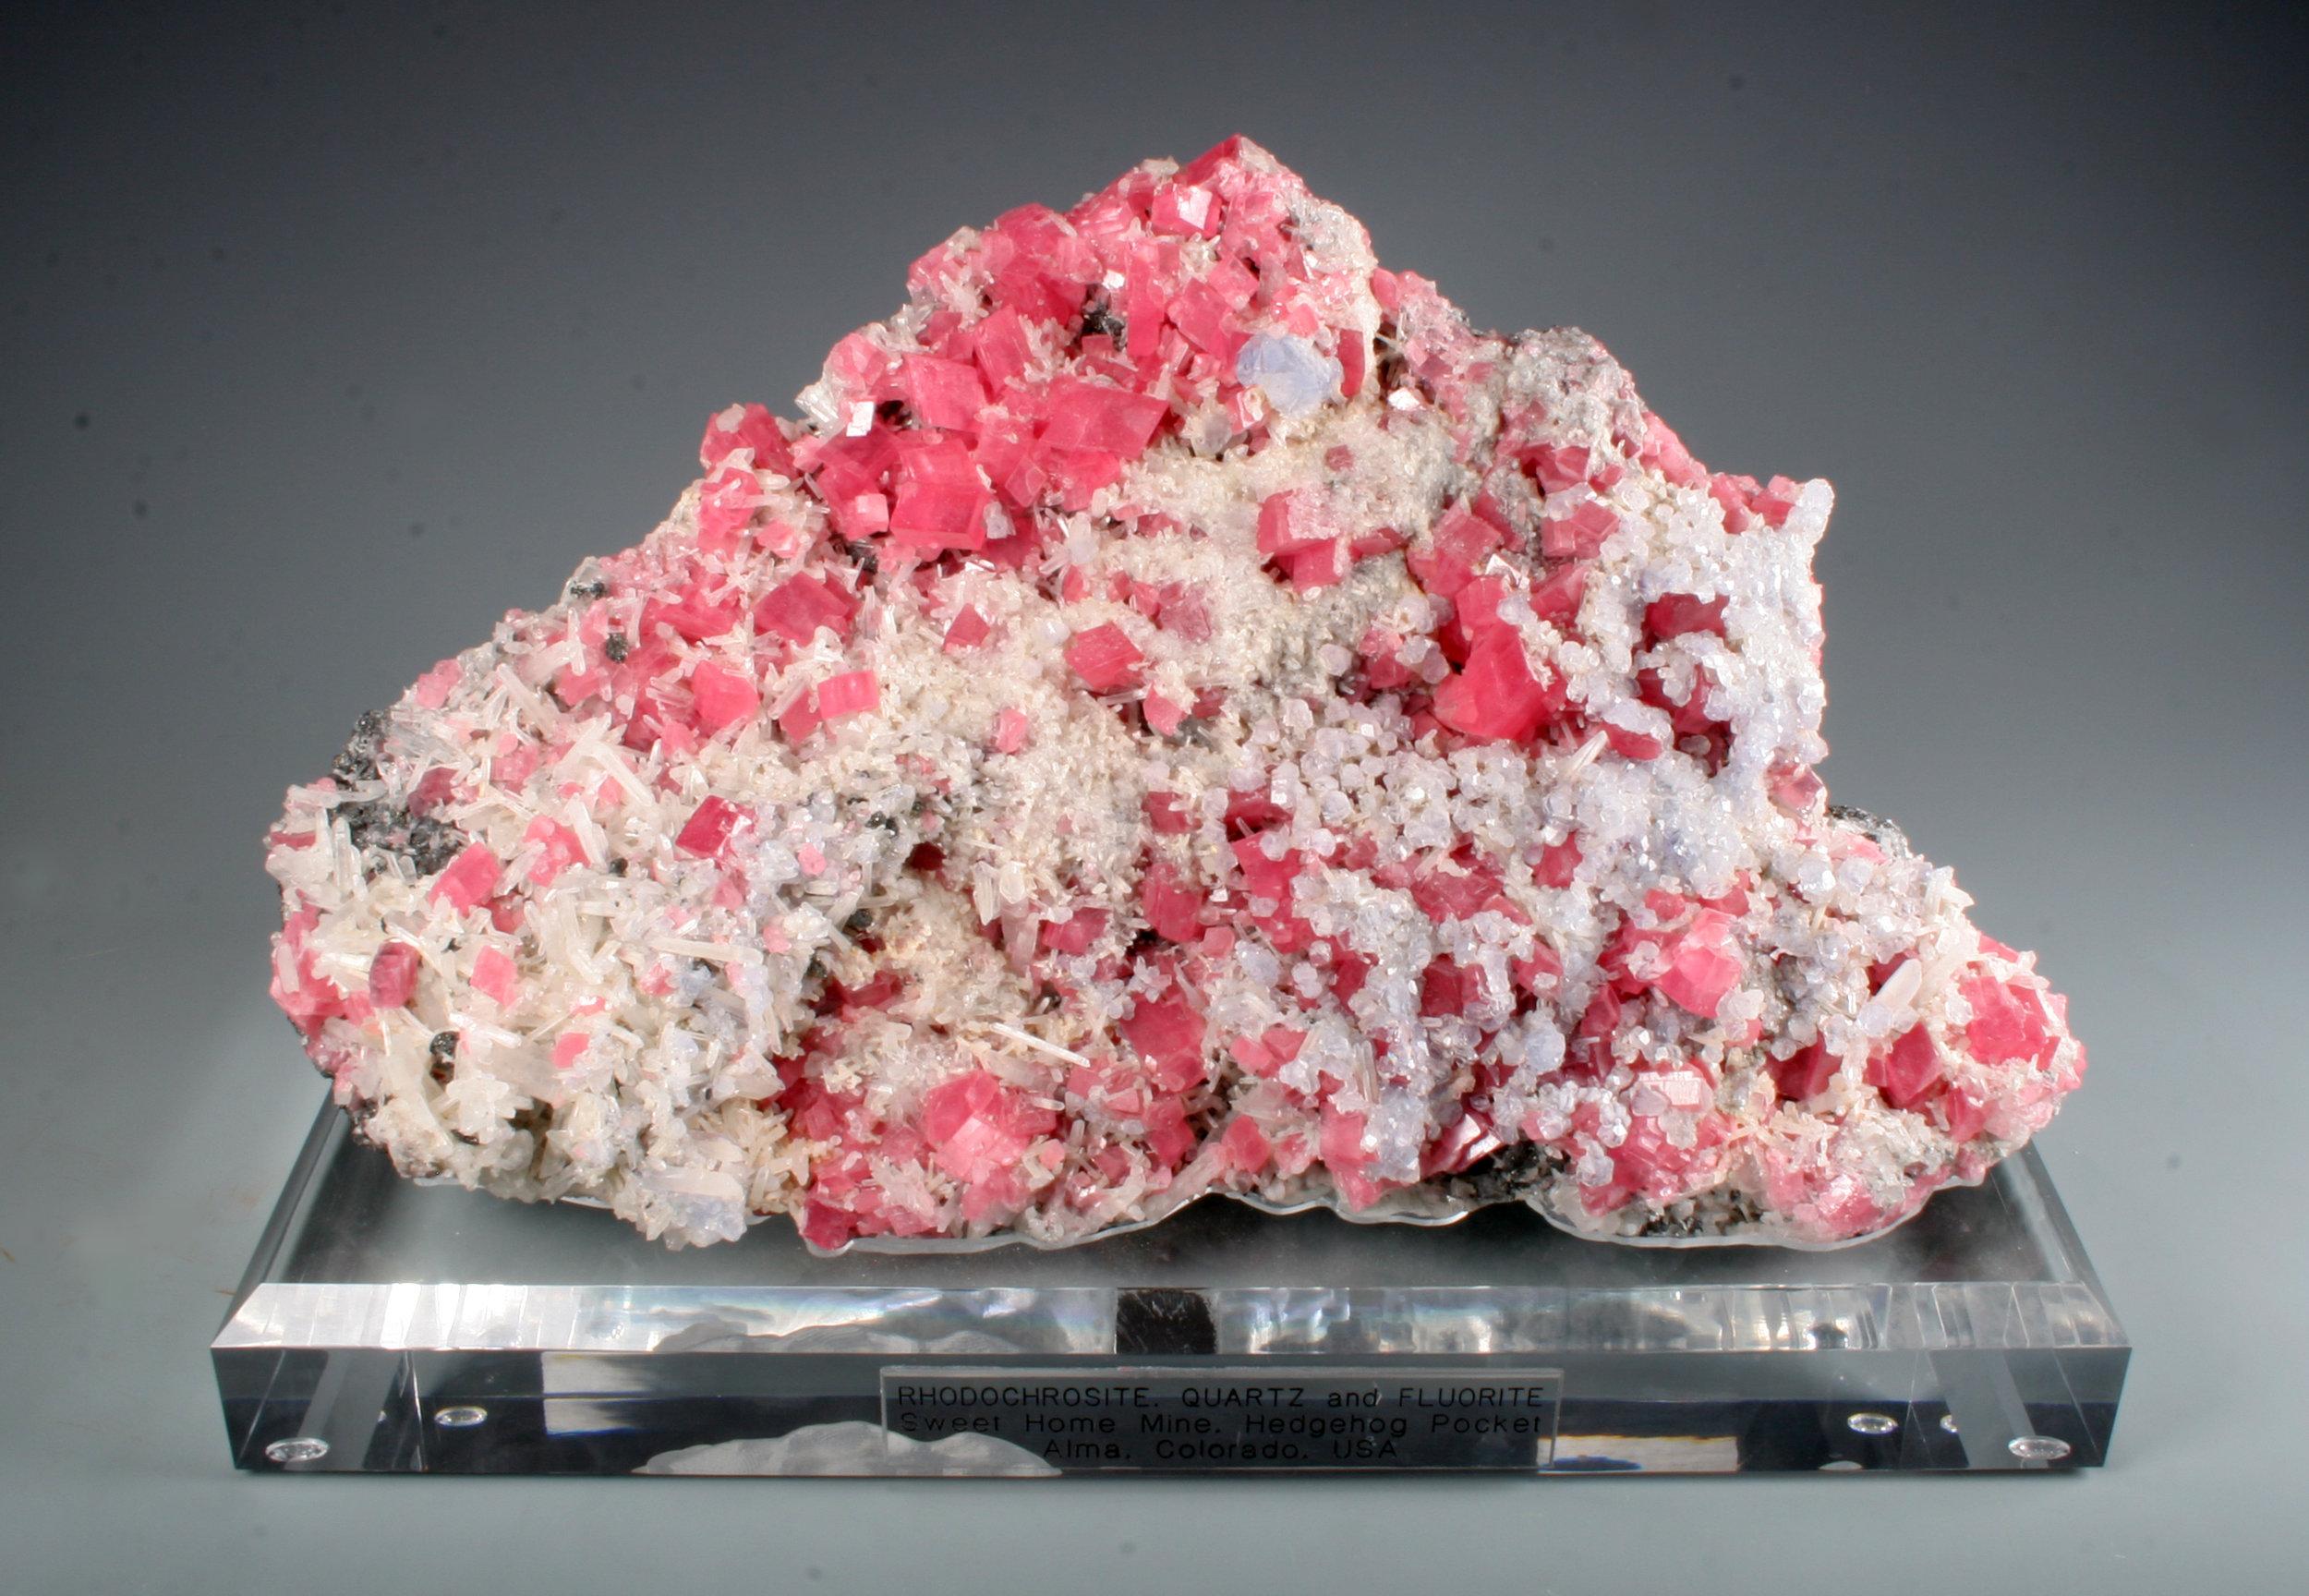 Rhodochrosite/Quartz/Fluorite